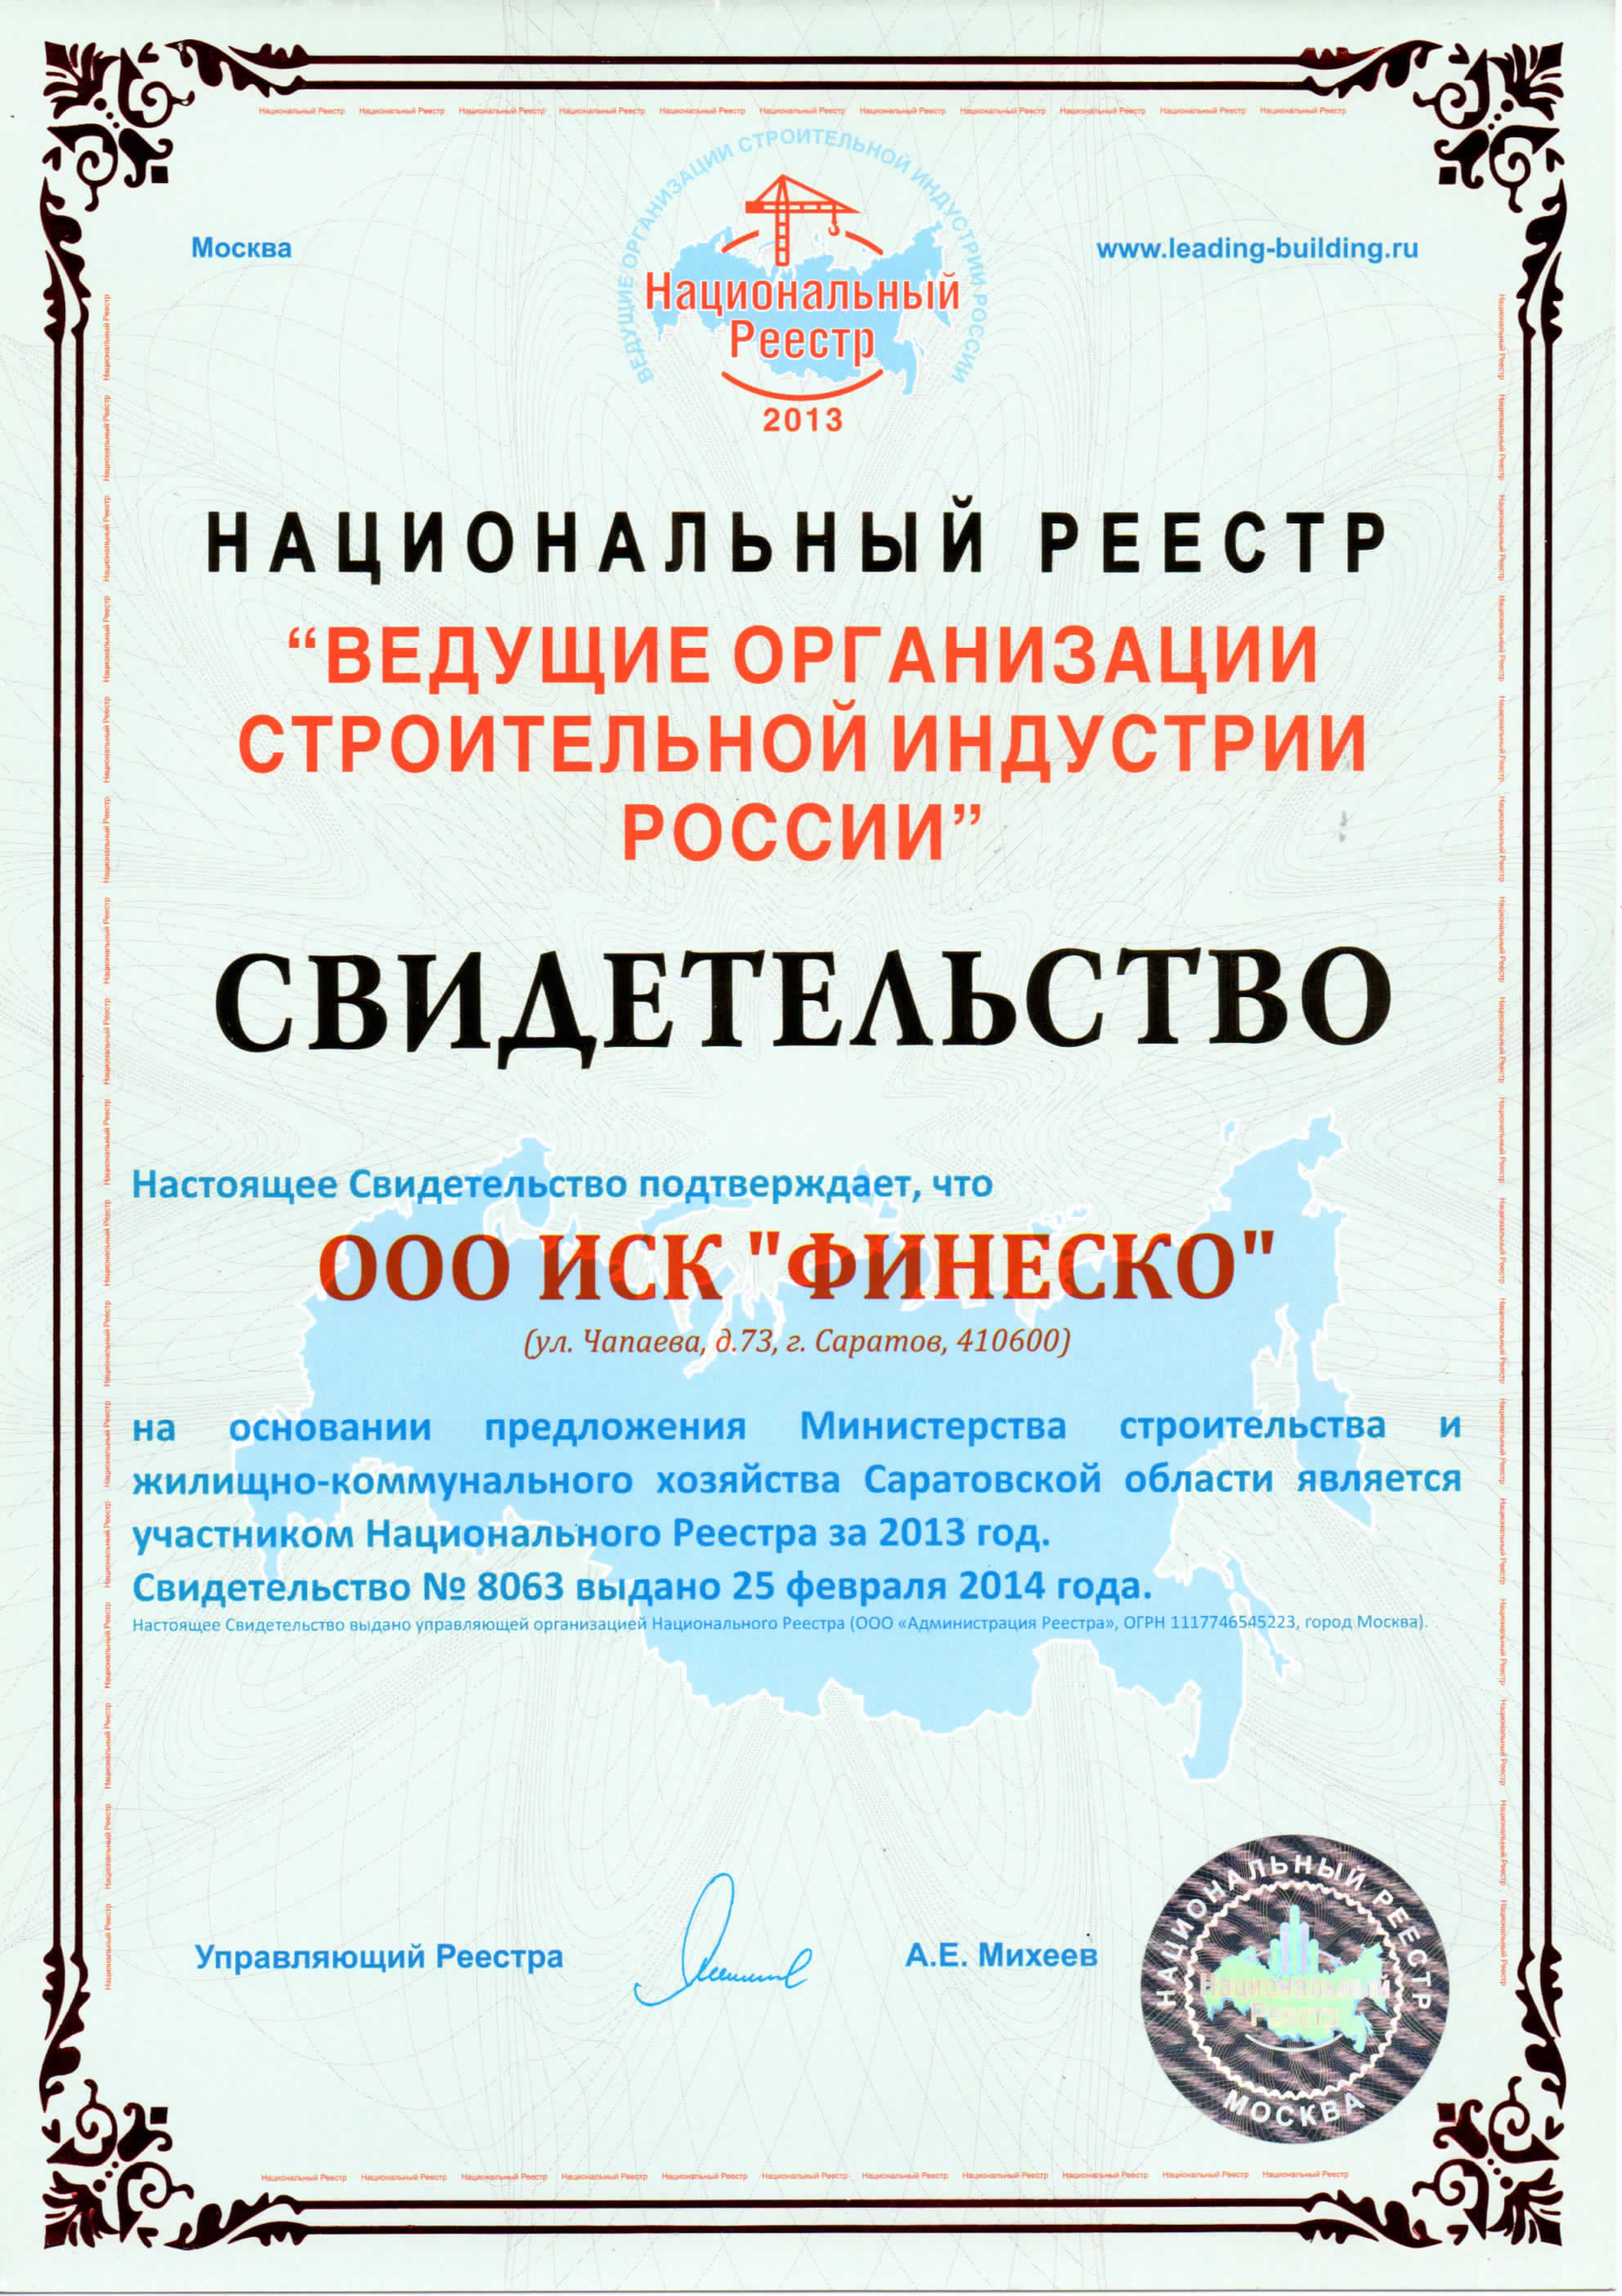 img004